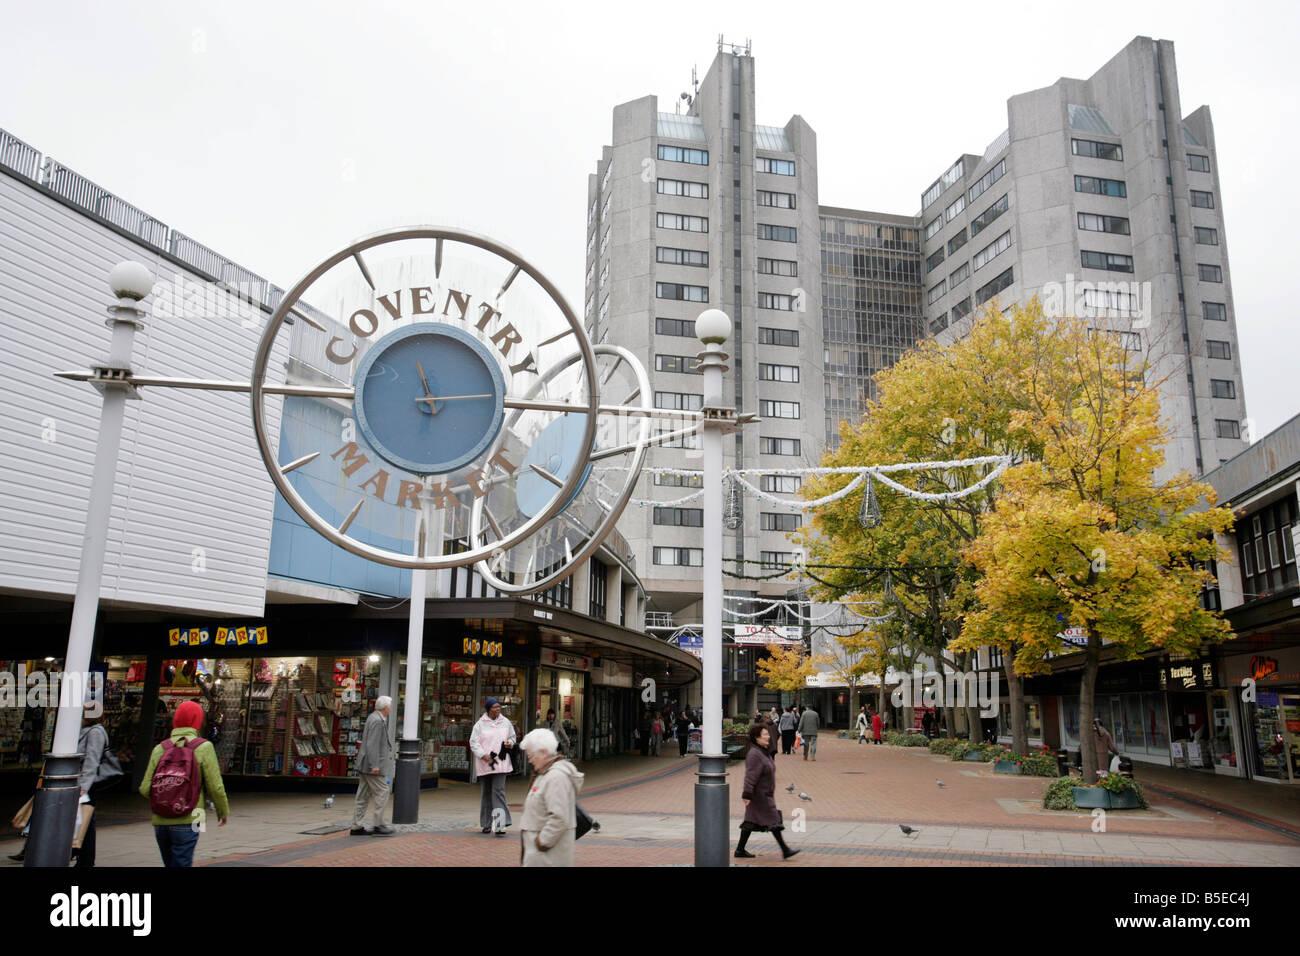 Coventry Market shopping precinct in Coventry, UK - Stock Image